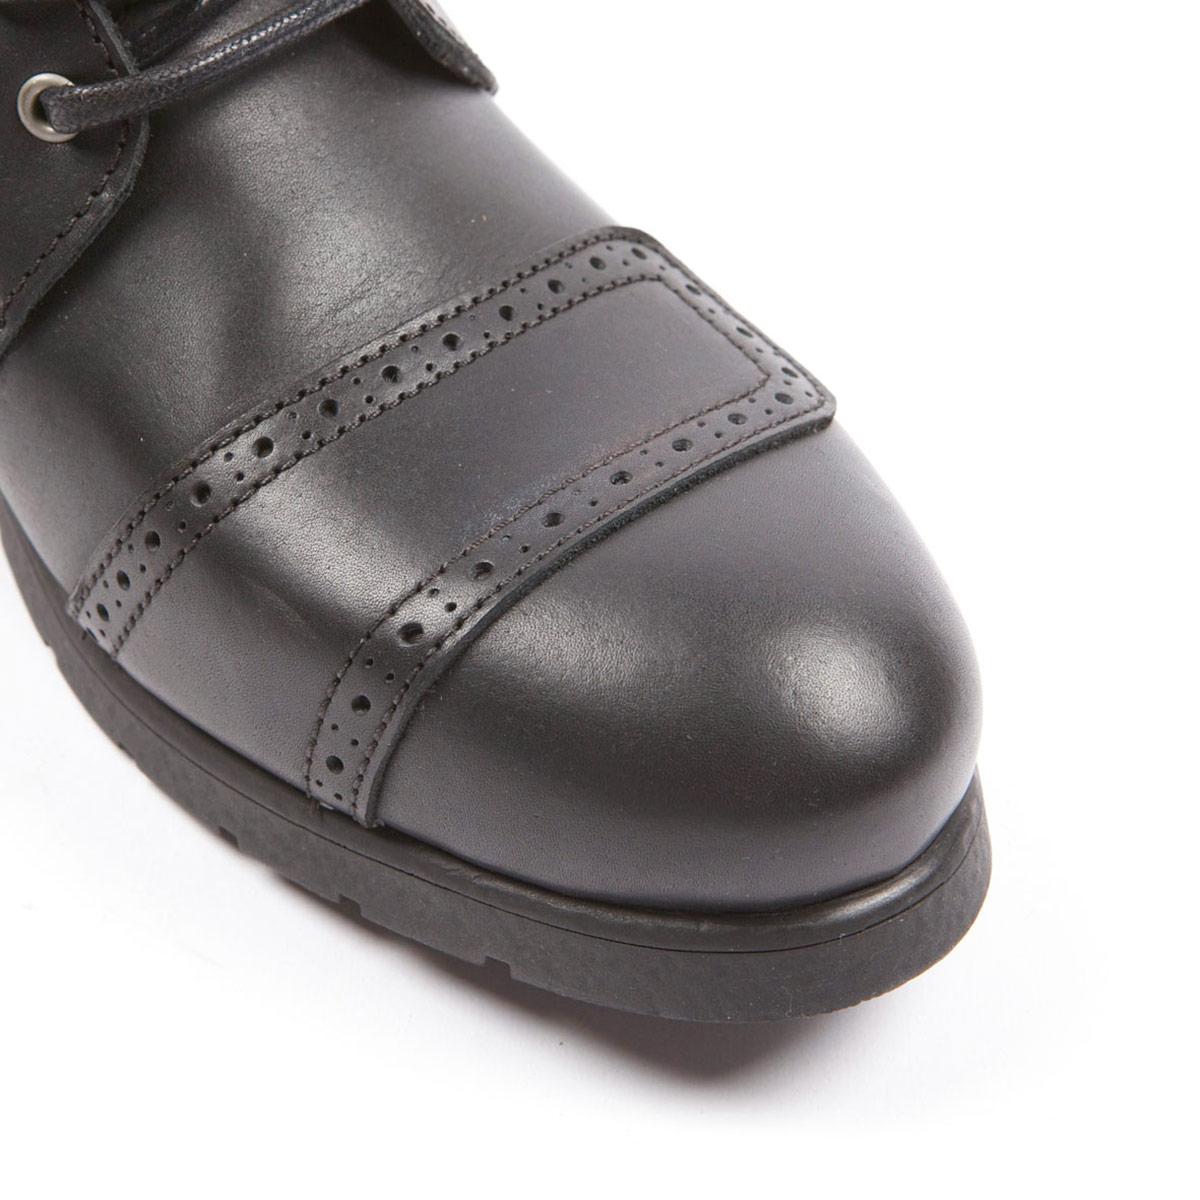 Helstons Travel Boots Black-Tan